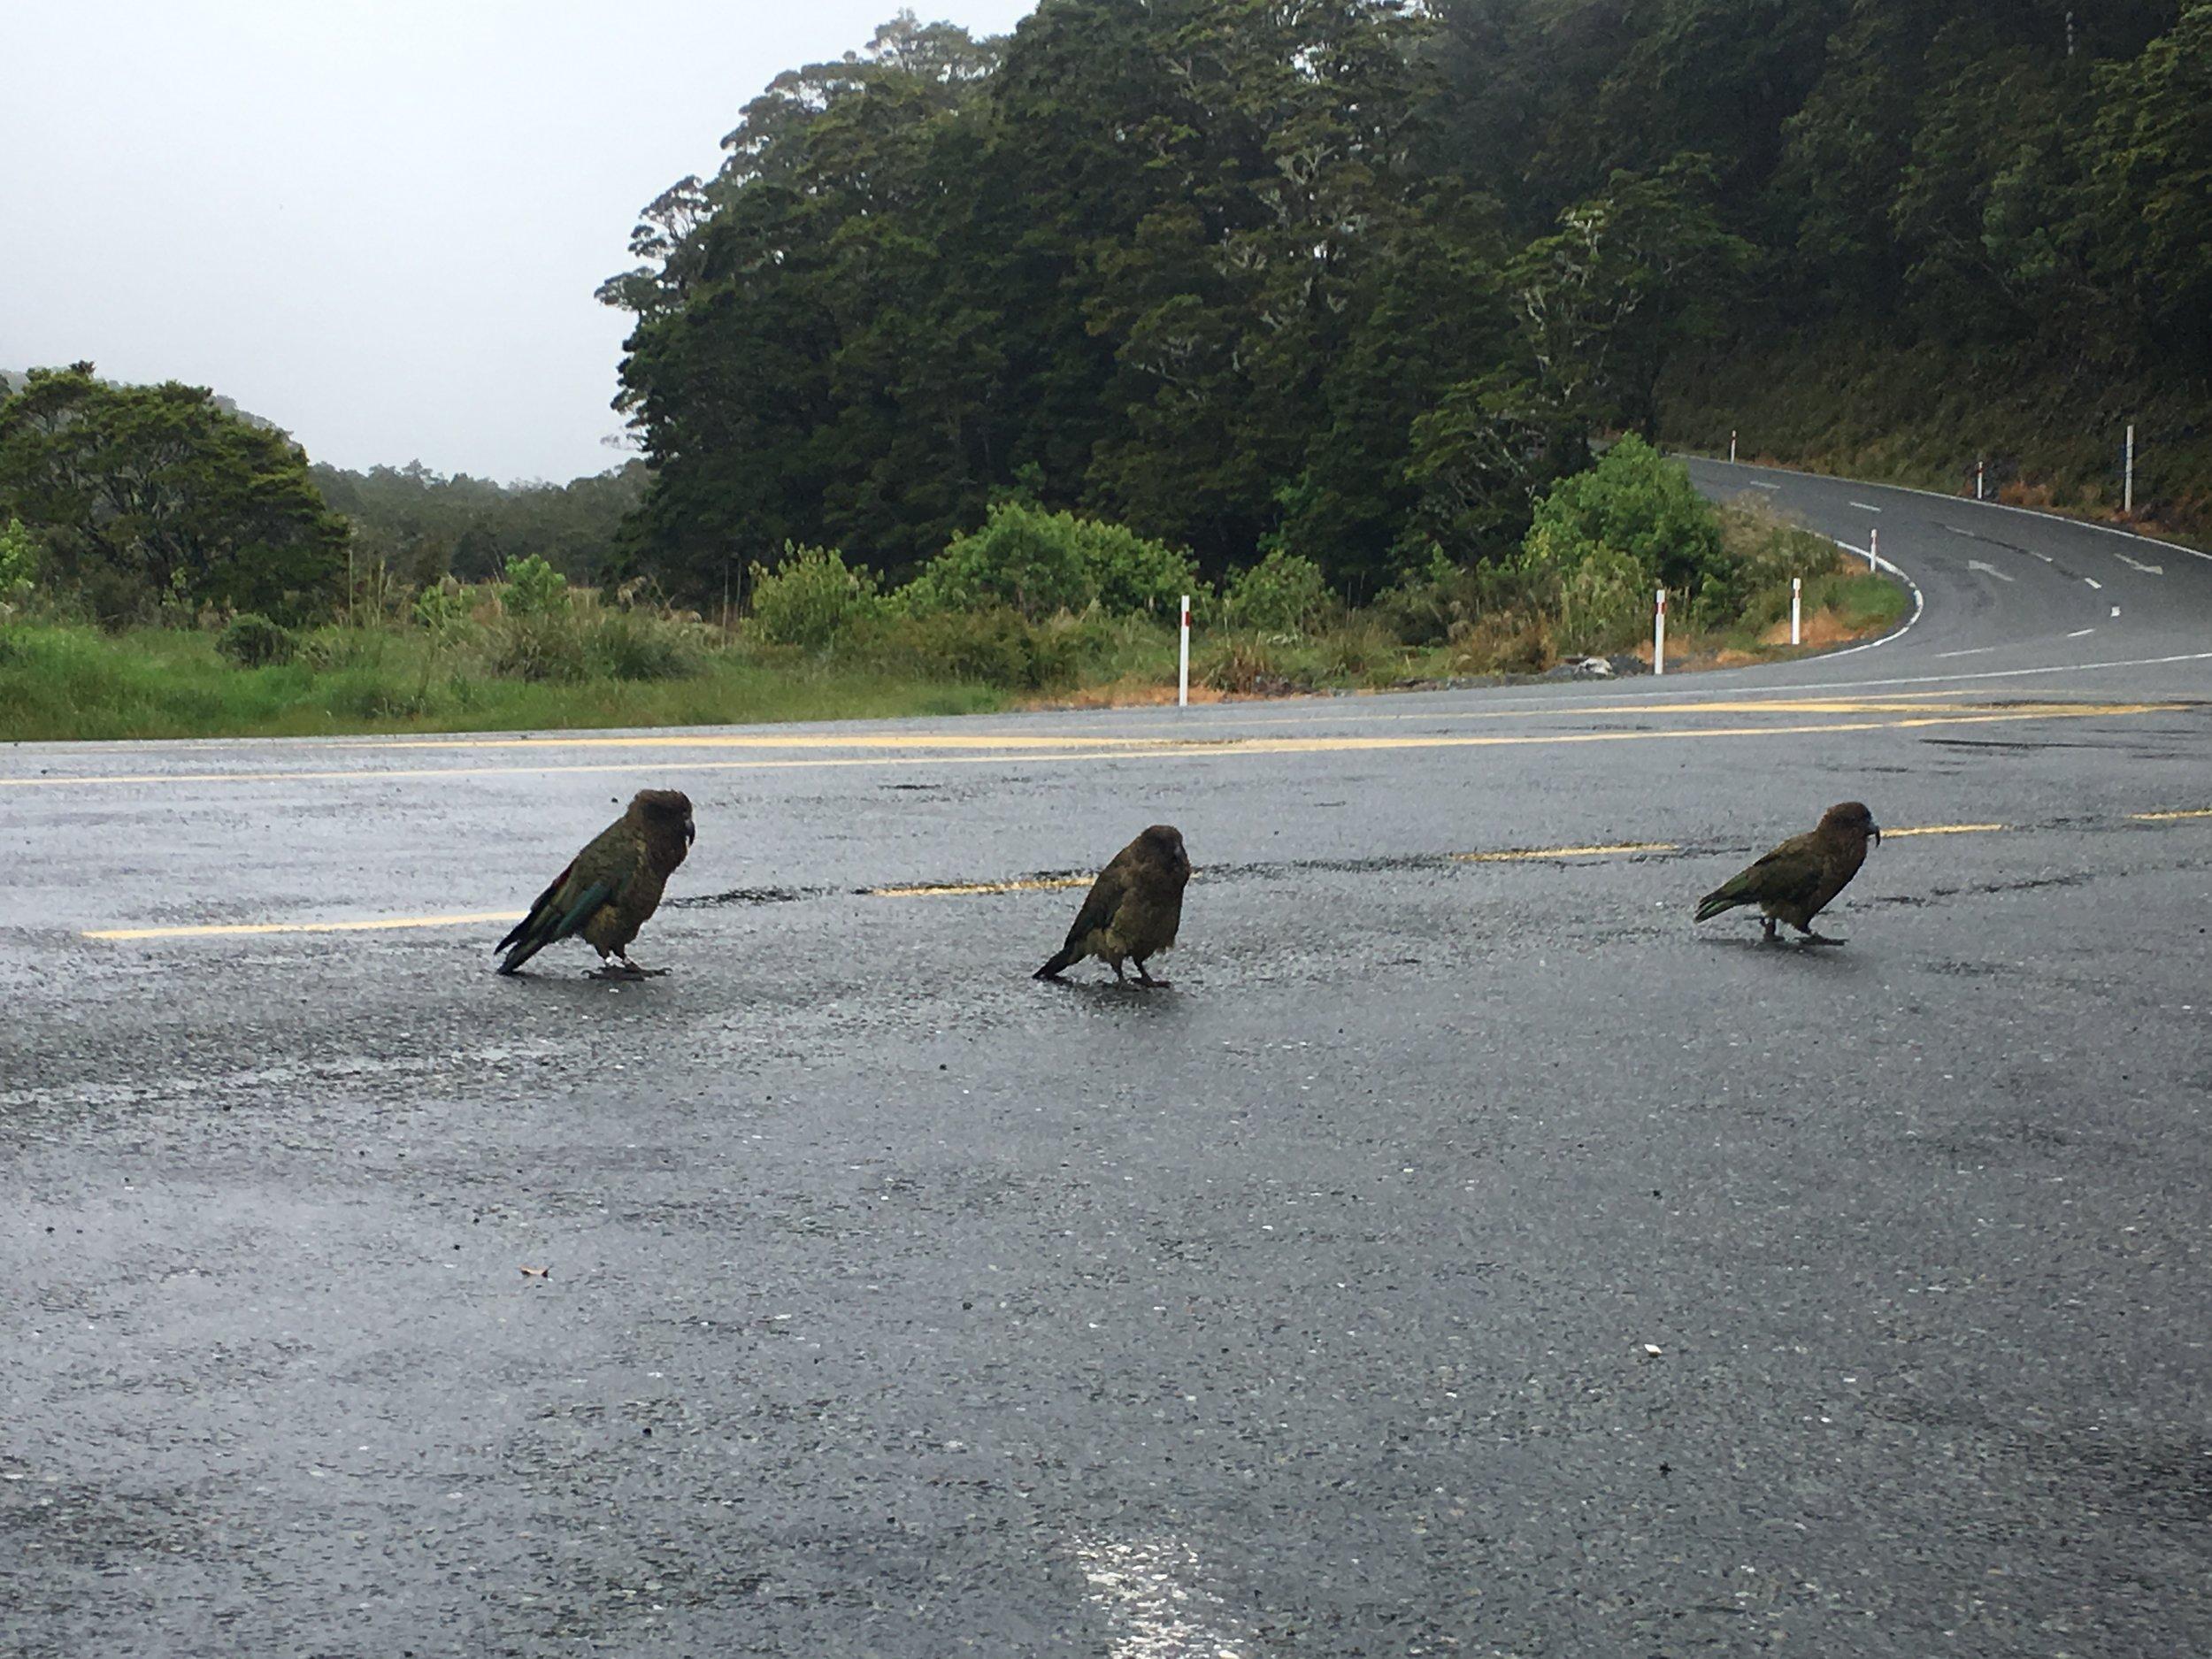 Cheeky Kea birds